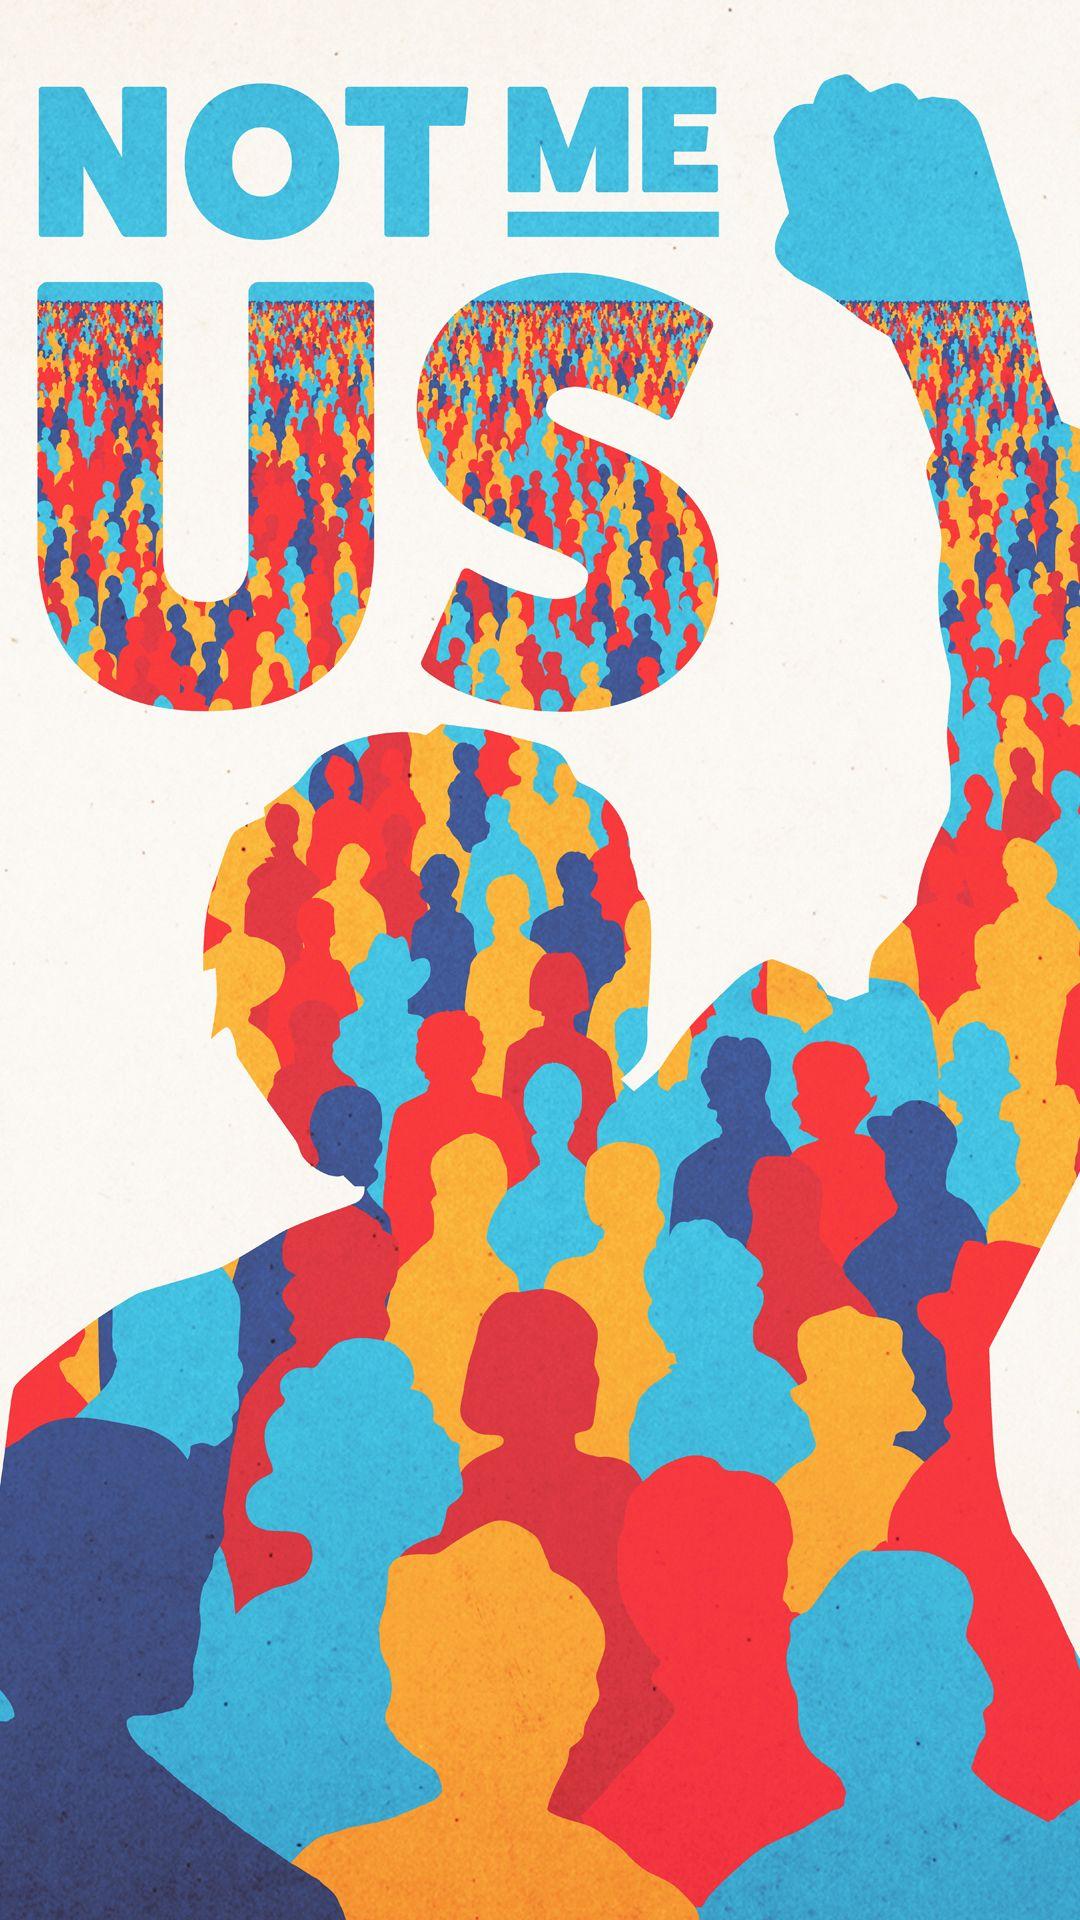 Poster design tumblr - Aled Lewis S Bernie Sanders Poster Design Is The Best I Ve Seen